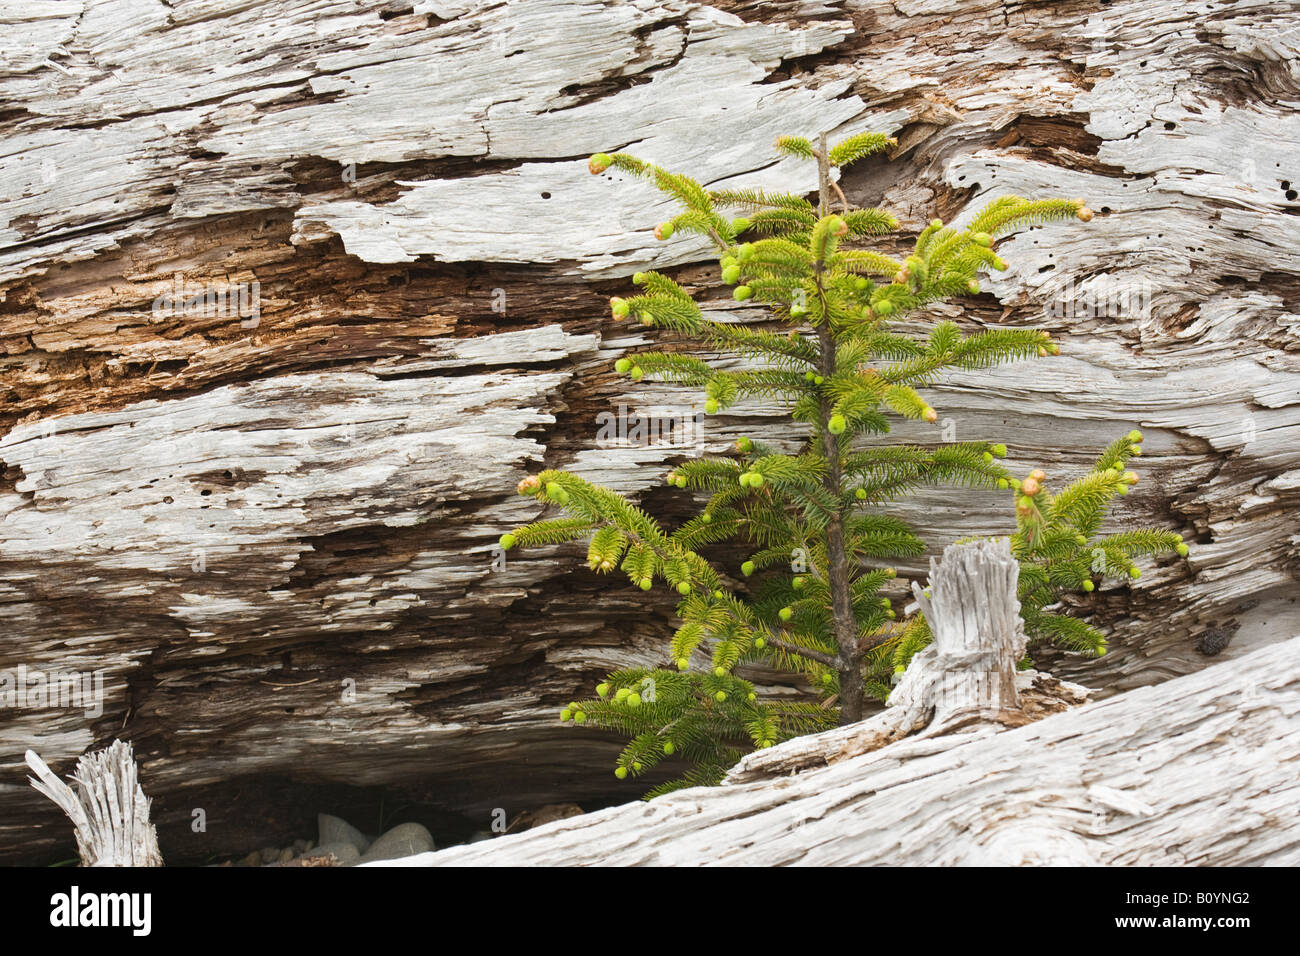 Young spruce seedling, Rialto Beach, Washington, United States - Stock Image